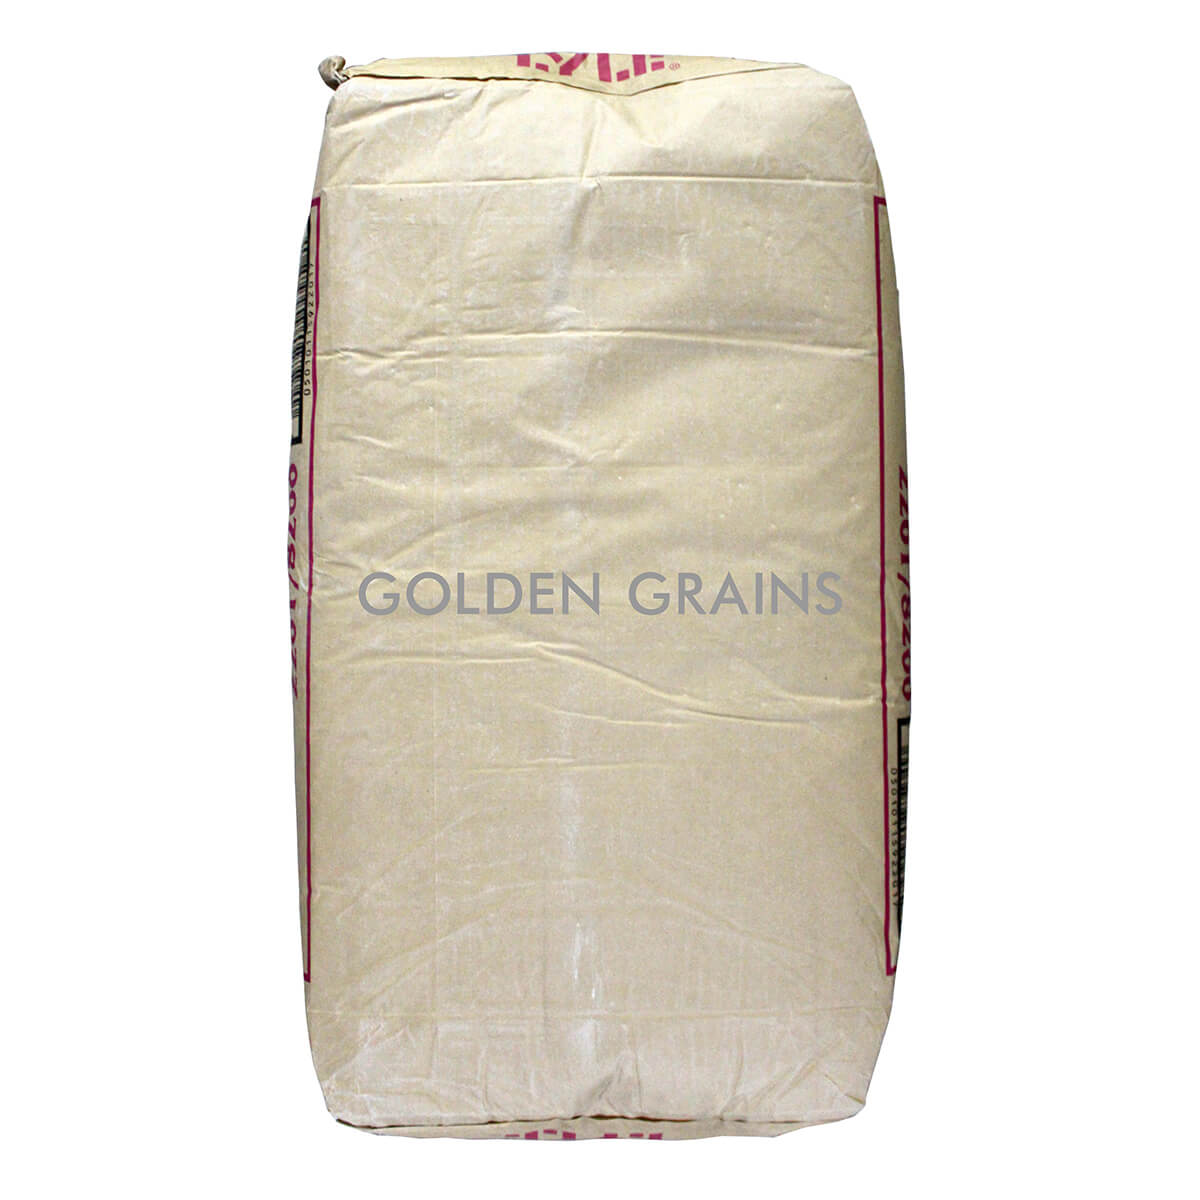 Golden Grains Tate & Lyle - Icing Sugar - Back.jpg